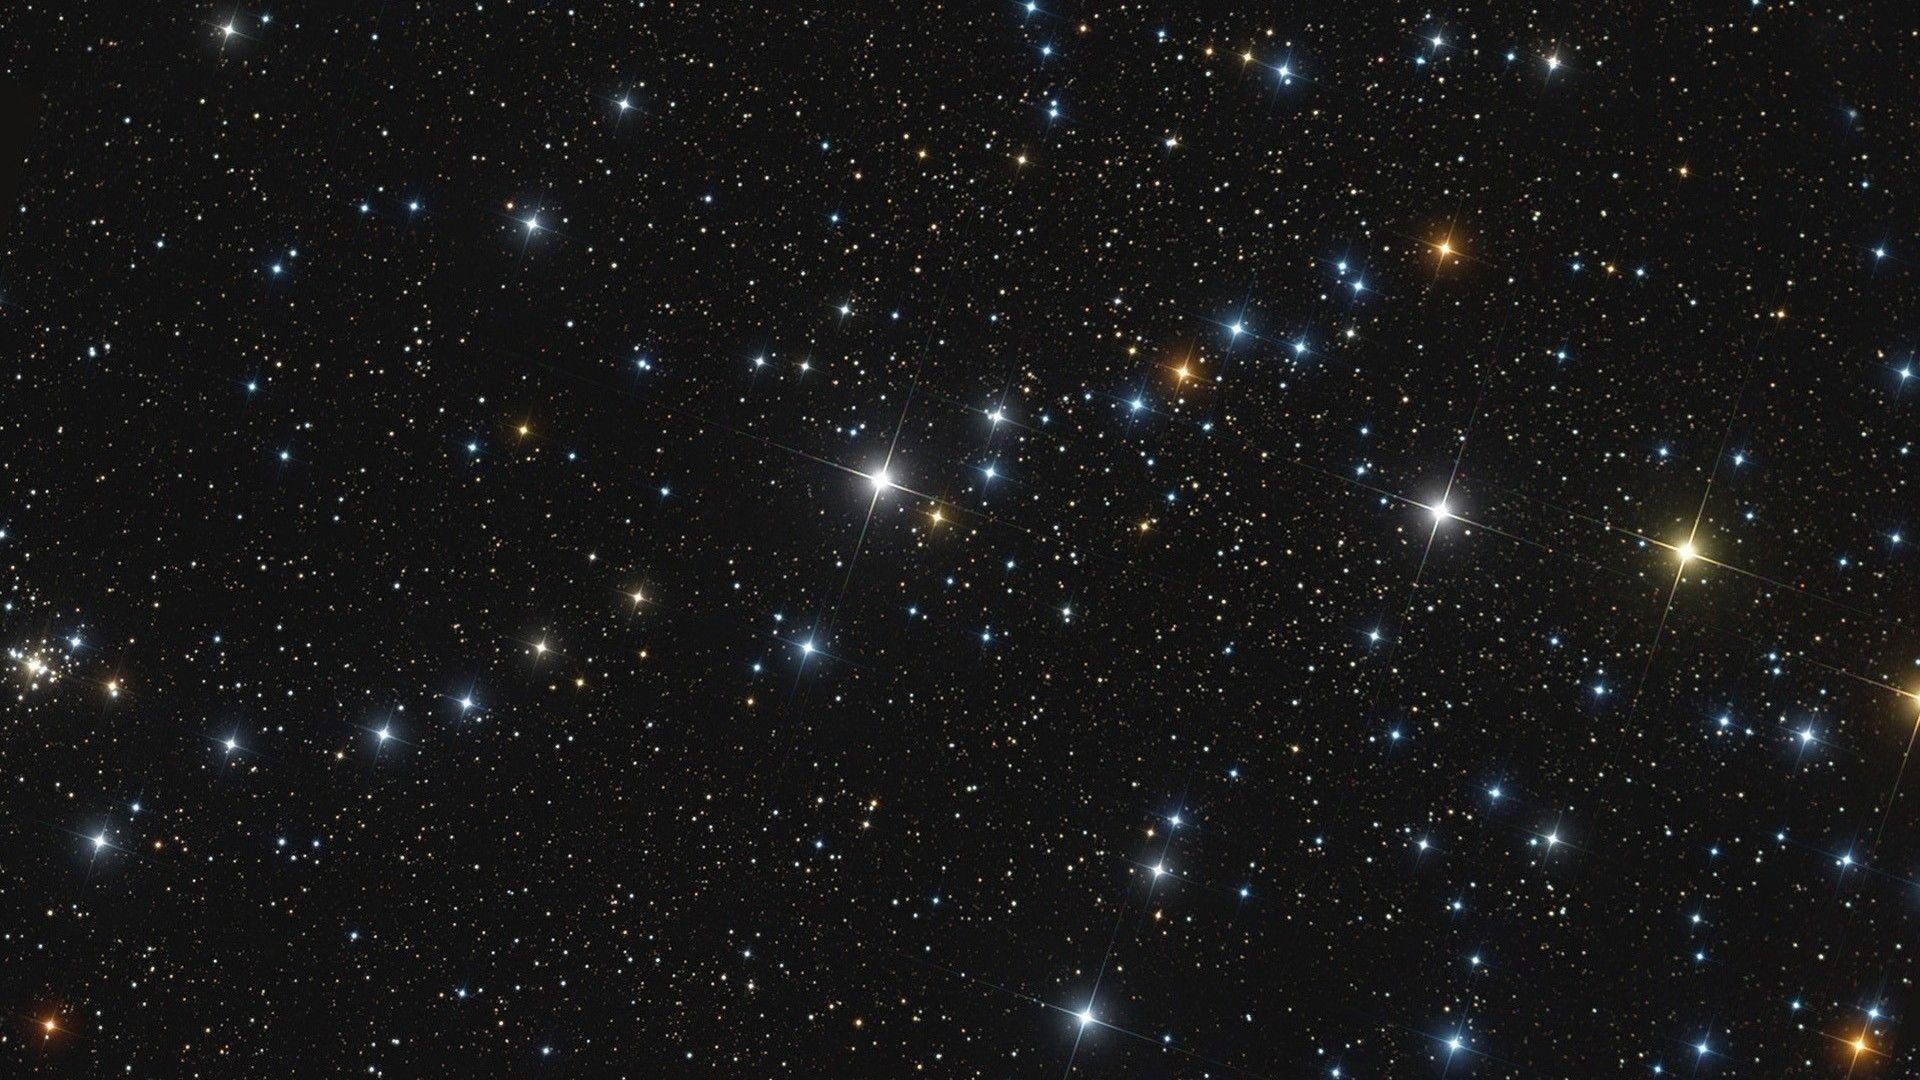 Space Stars Hd 12 Desktop Background - Hivewallpaper.com | Mister ...